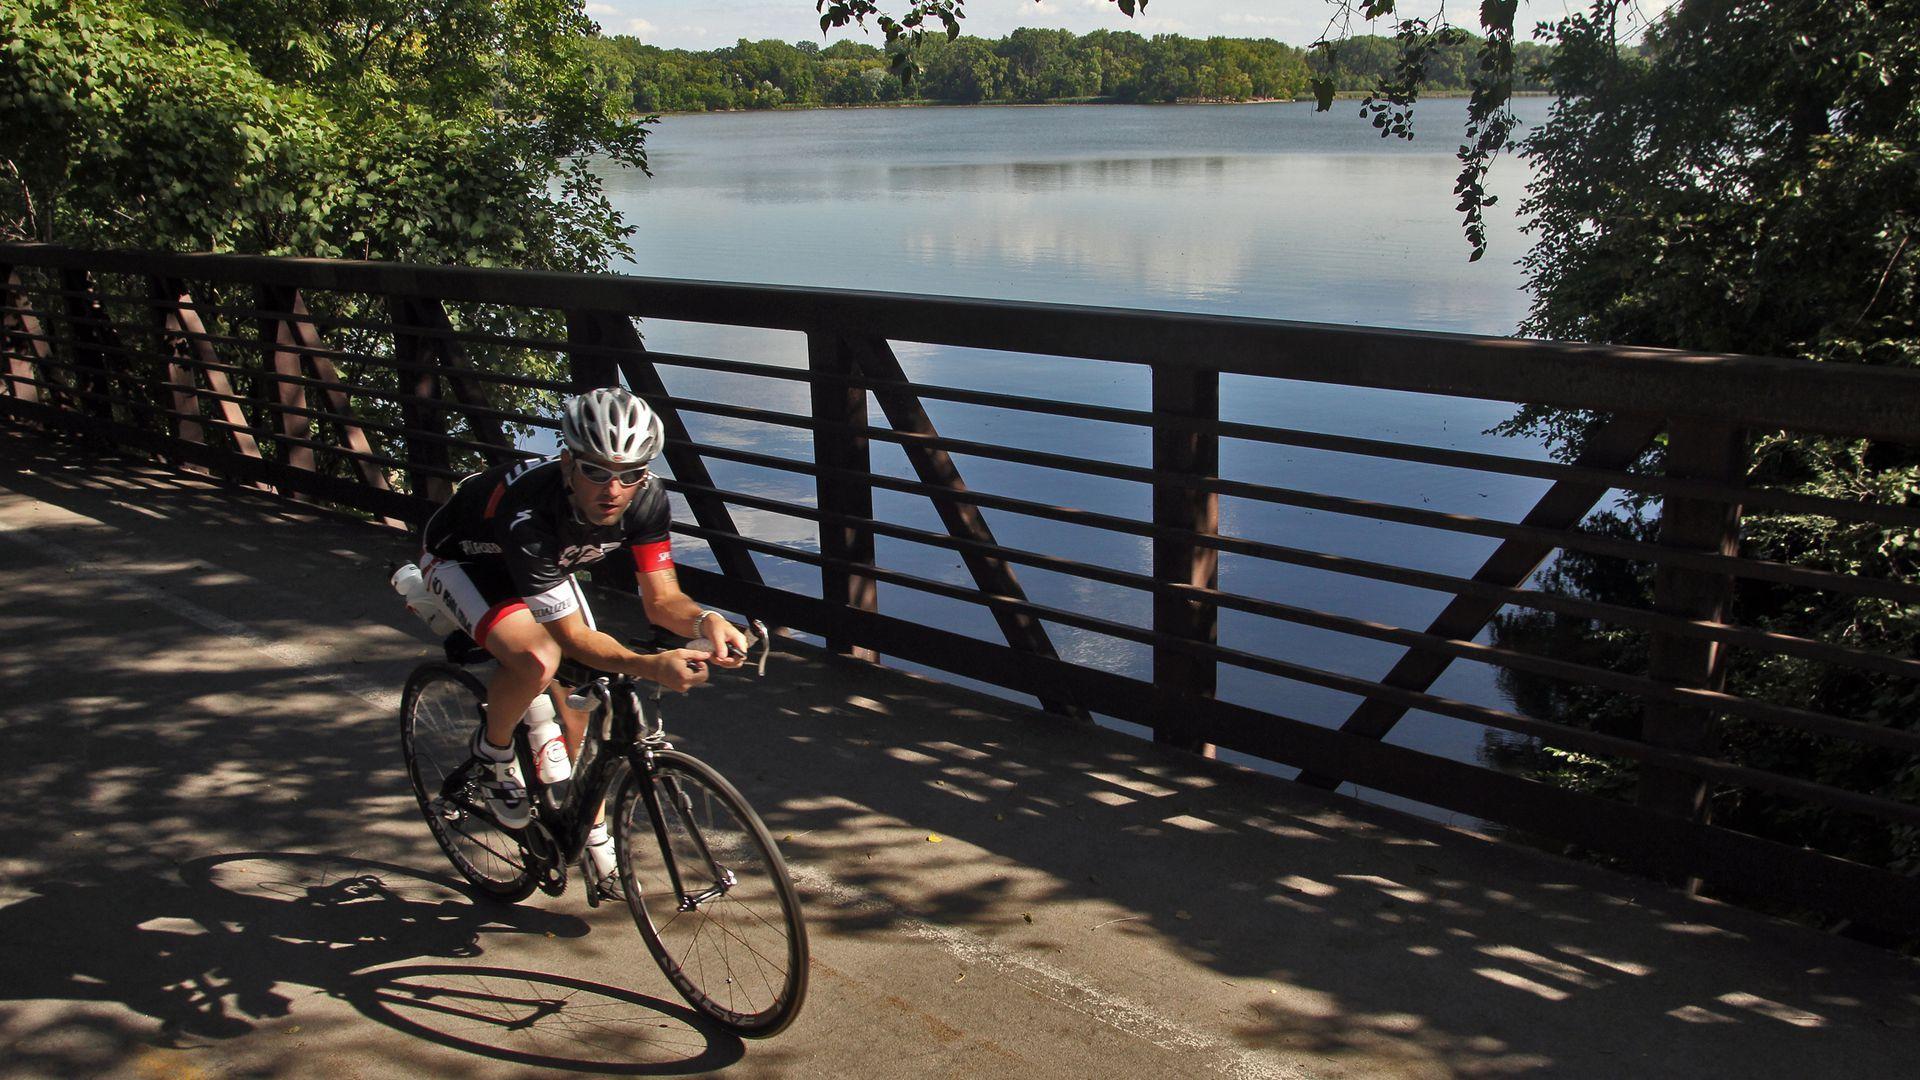 A bicyclist riding across a bridge.